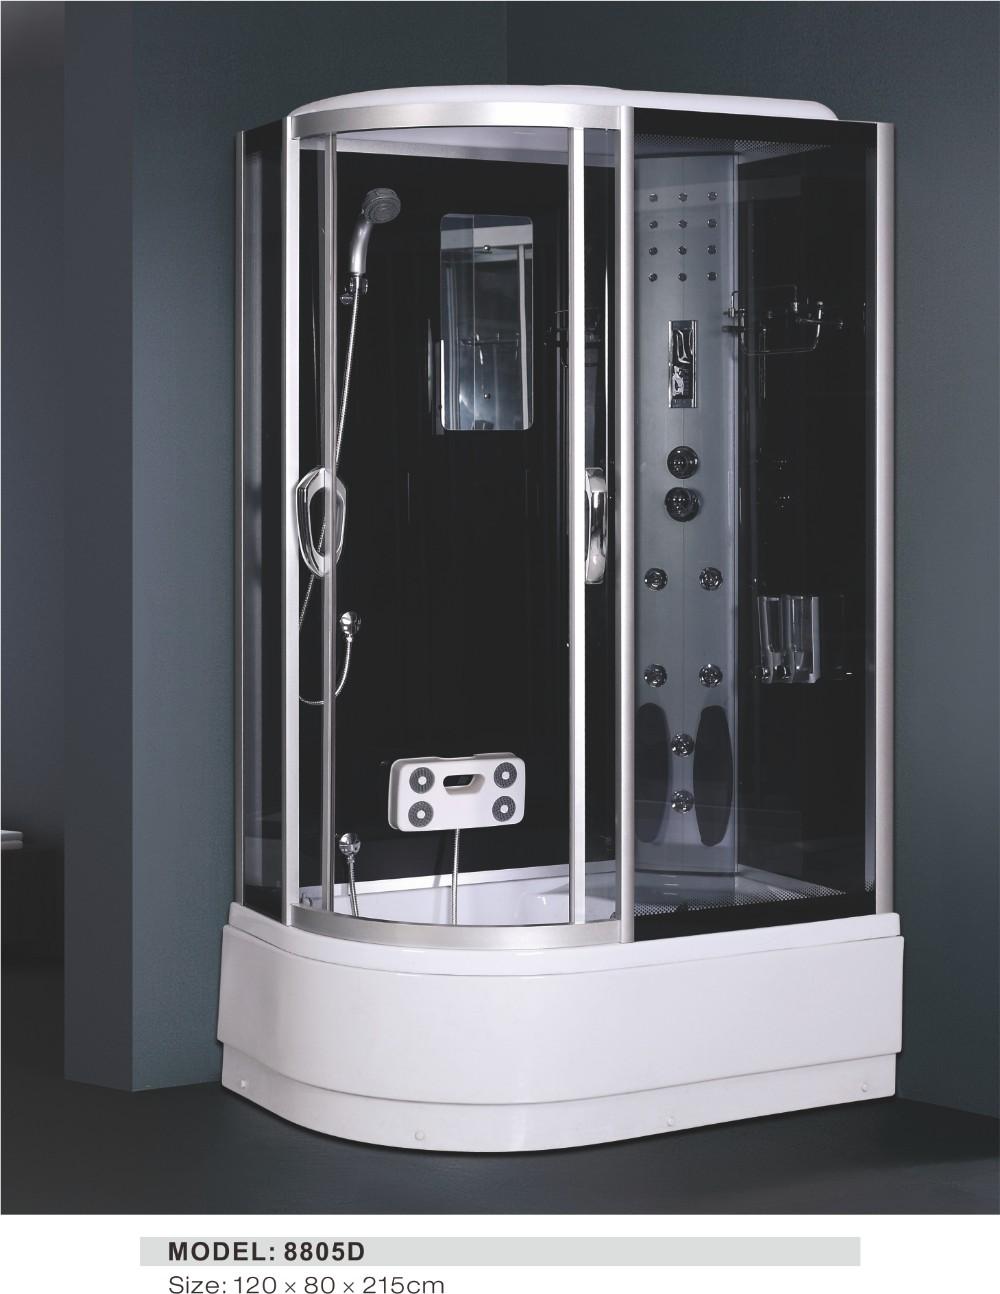 Charming American Standard Stainless Steel Air Curtain Bath Shower Cabin